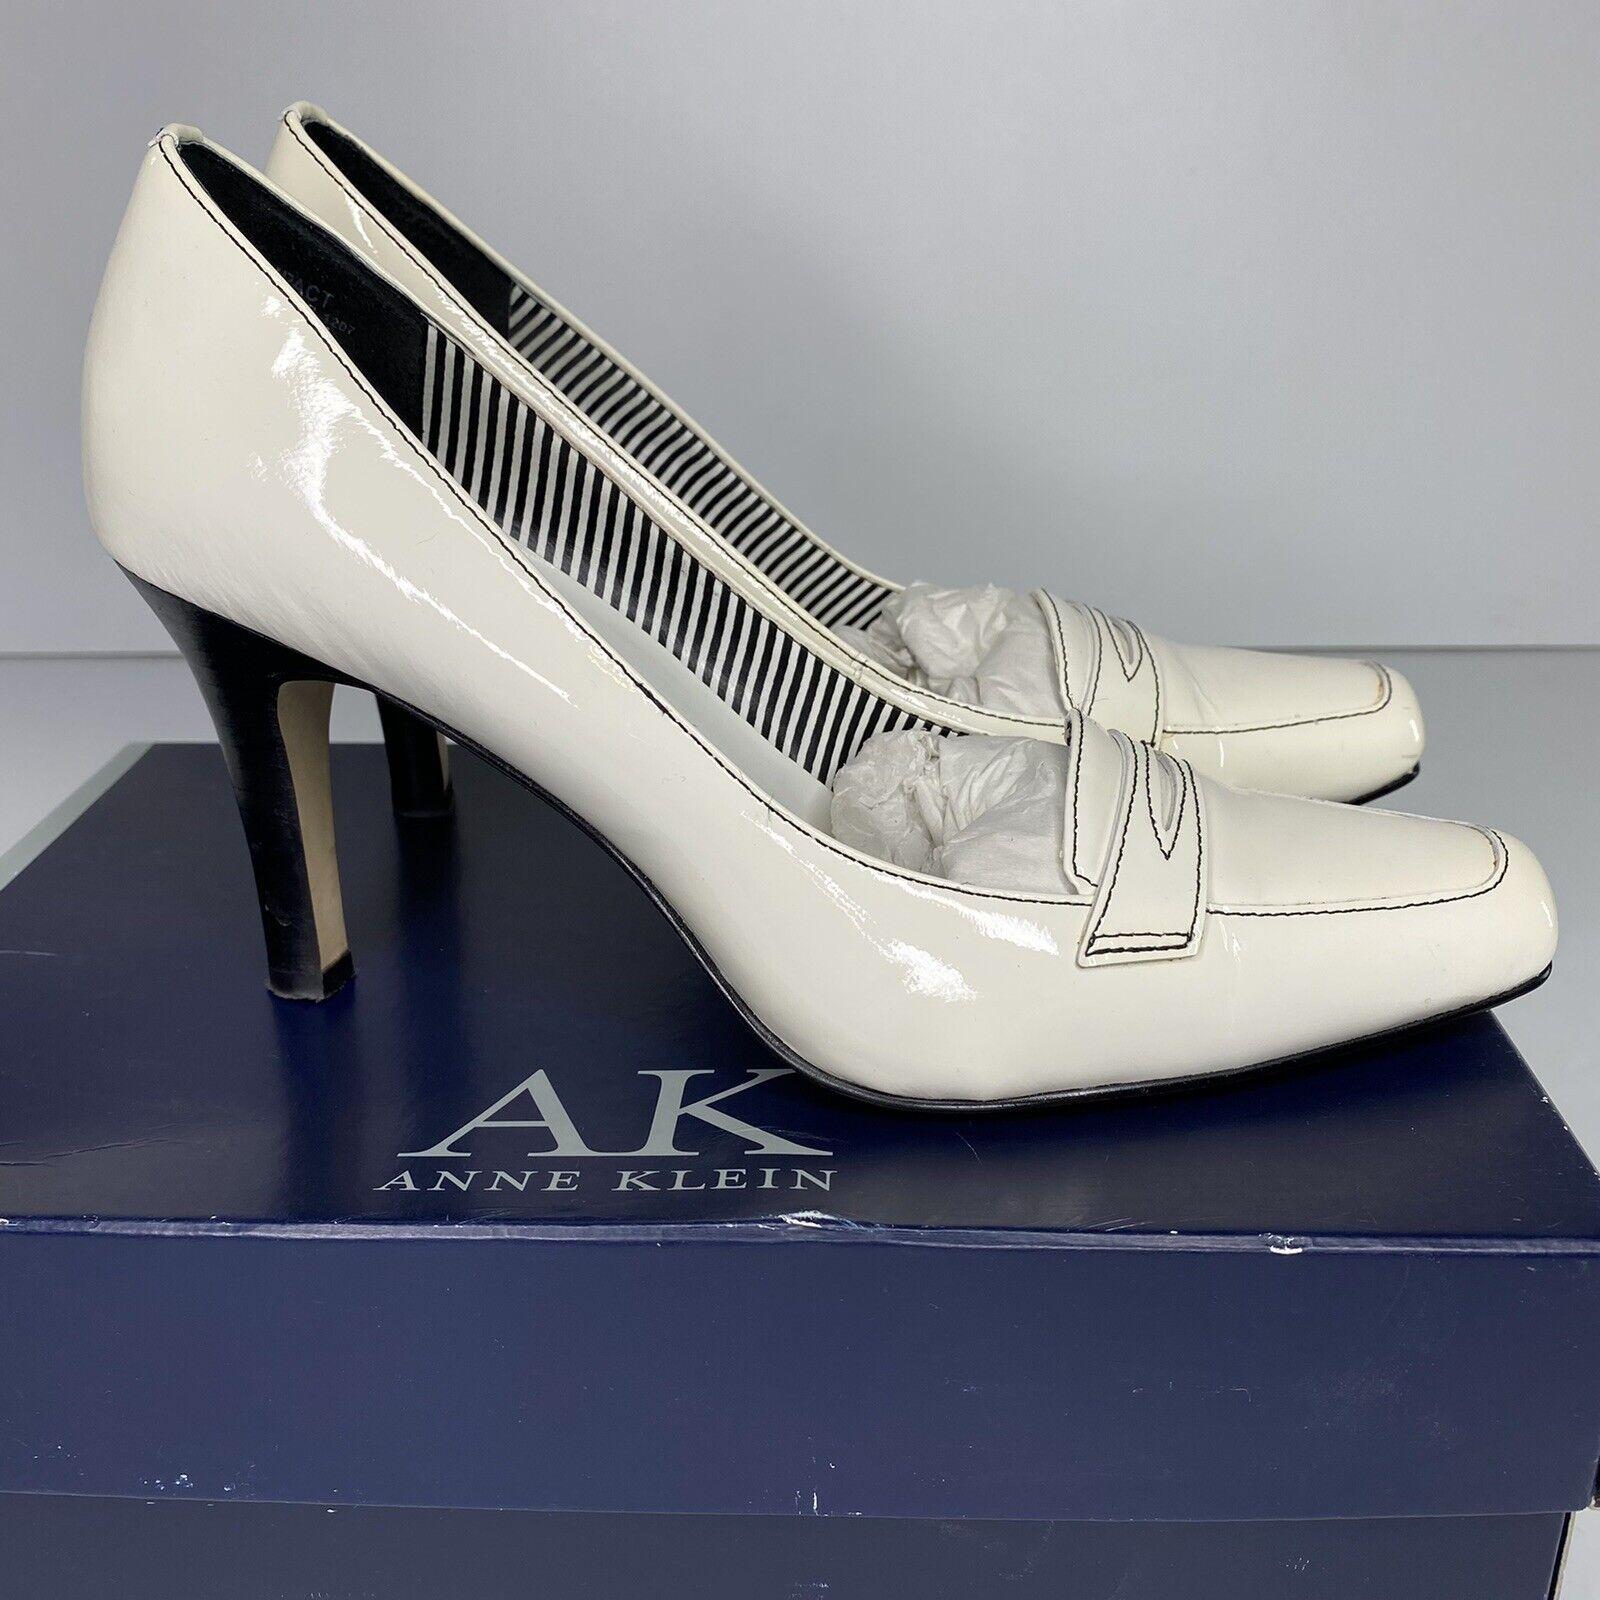 Anne Klein Womens Sz 7.5M AKImpact White Patent Leather Heels Shoes Pumps Box